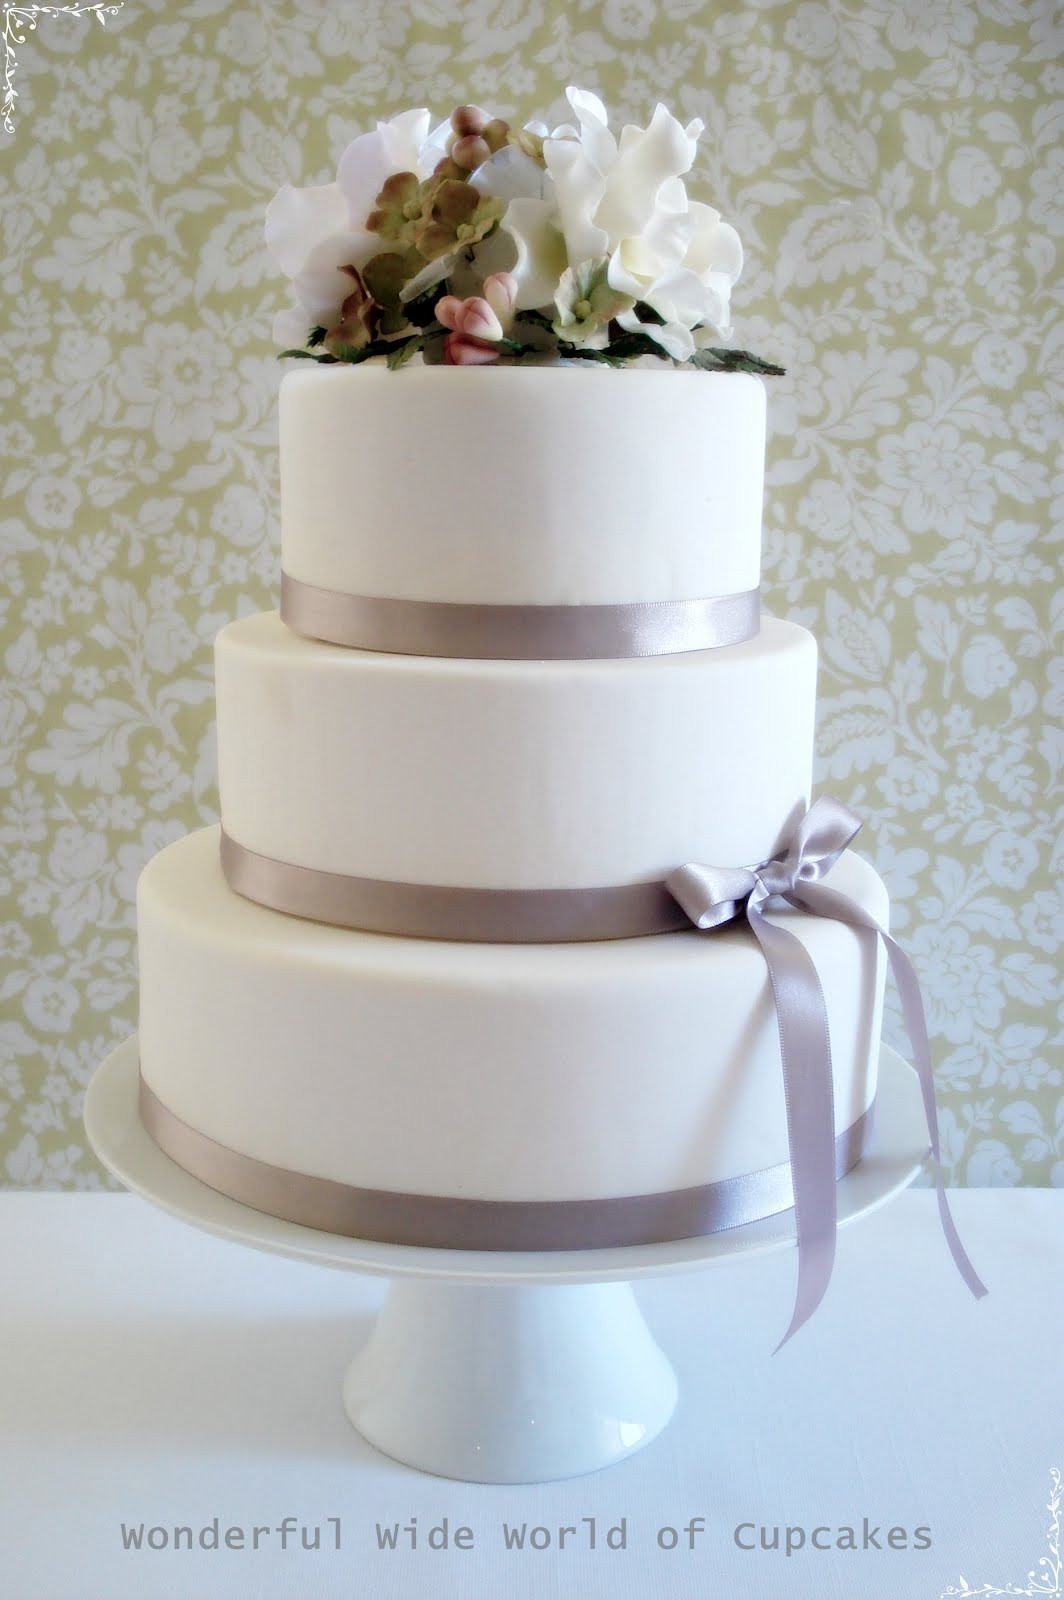 3 Layered Wedding Cakes  Small Wedding Cakes Wedding Plan Ideas